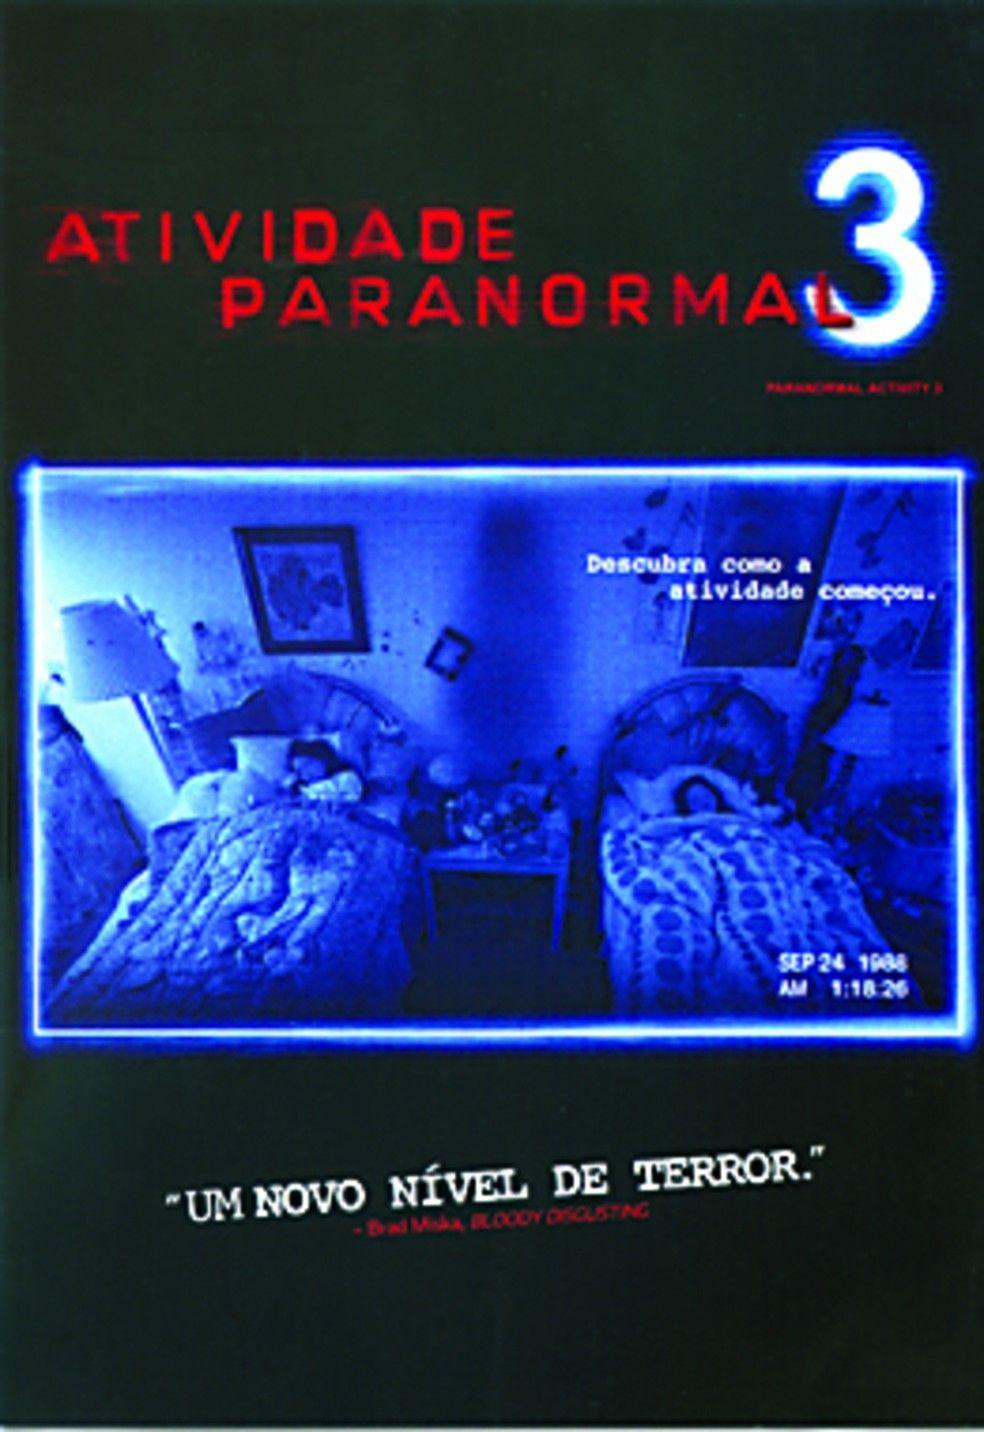 Paranormal Activity 3 Id1326707308 Atividade Paranormal Atividade Paranormal 3 Paranormal